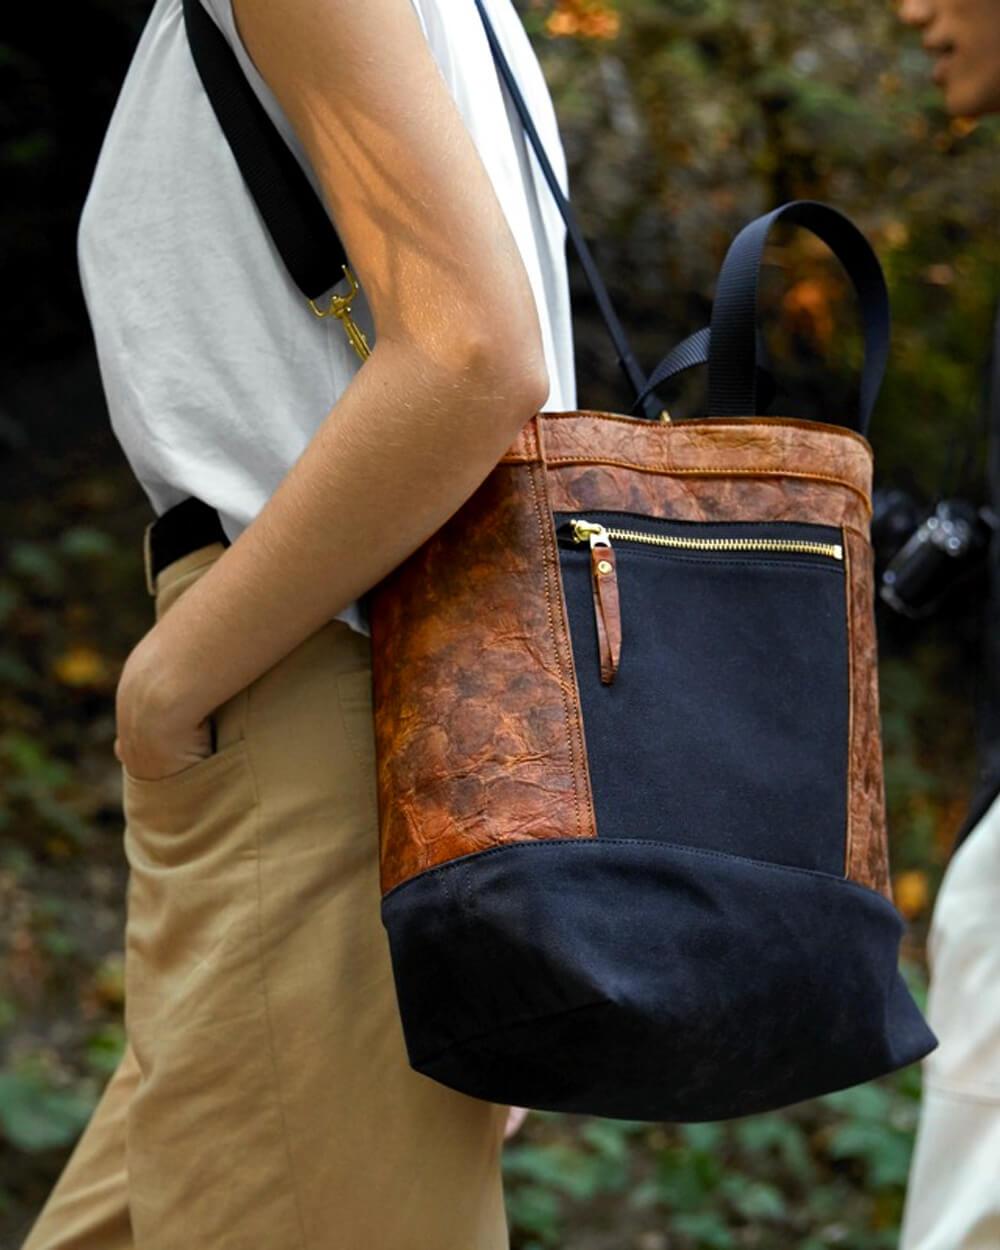 Bolt Threads mushroom leather bag